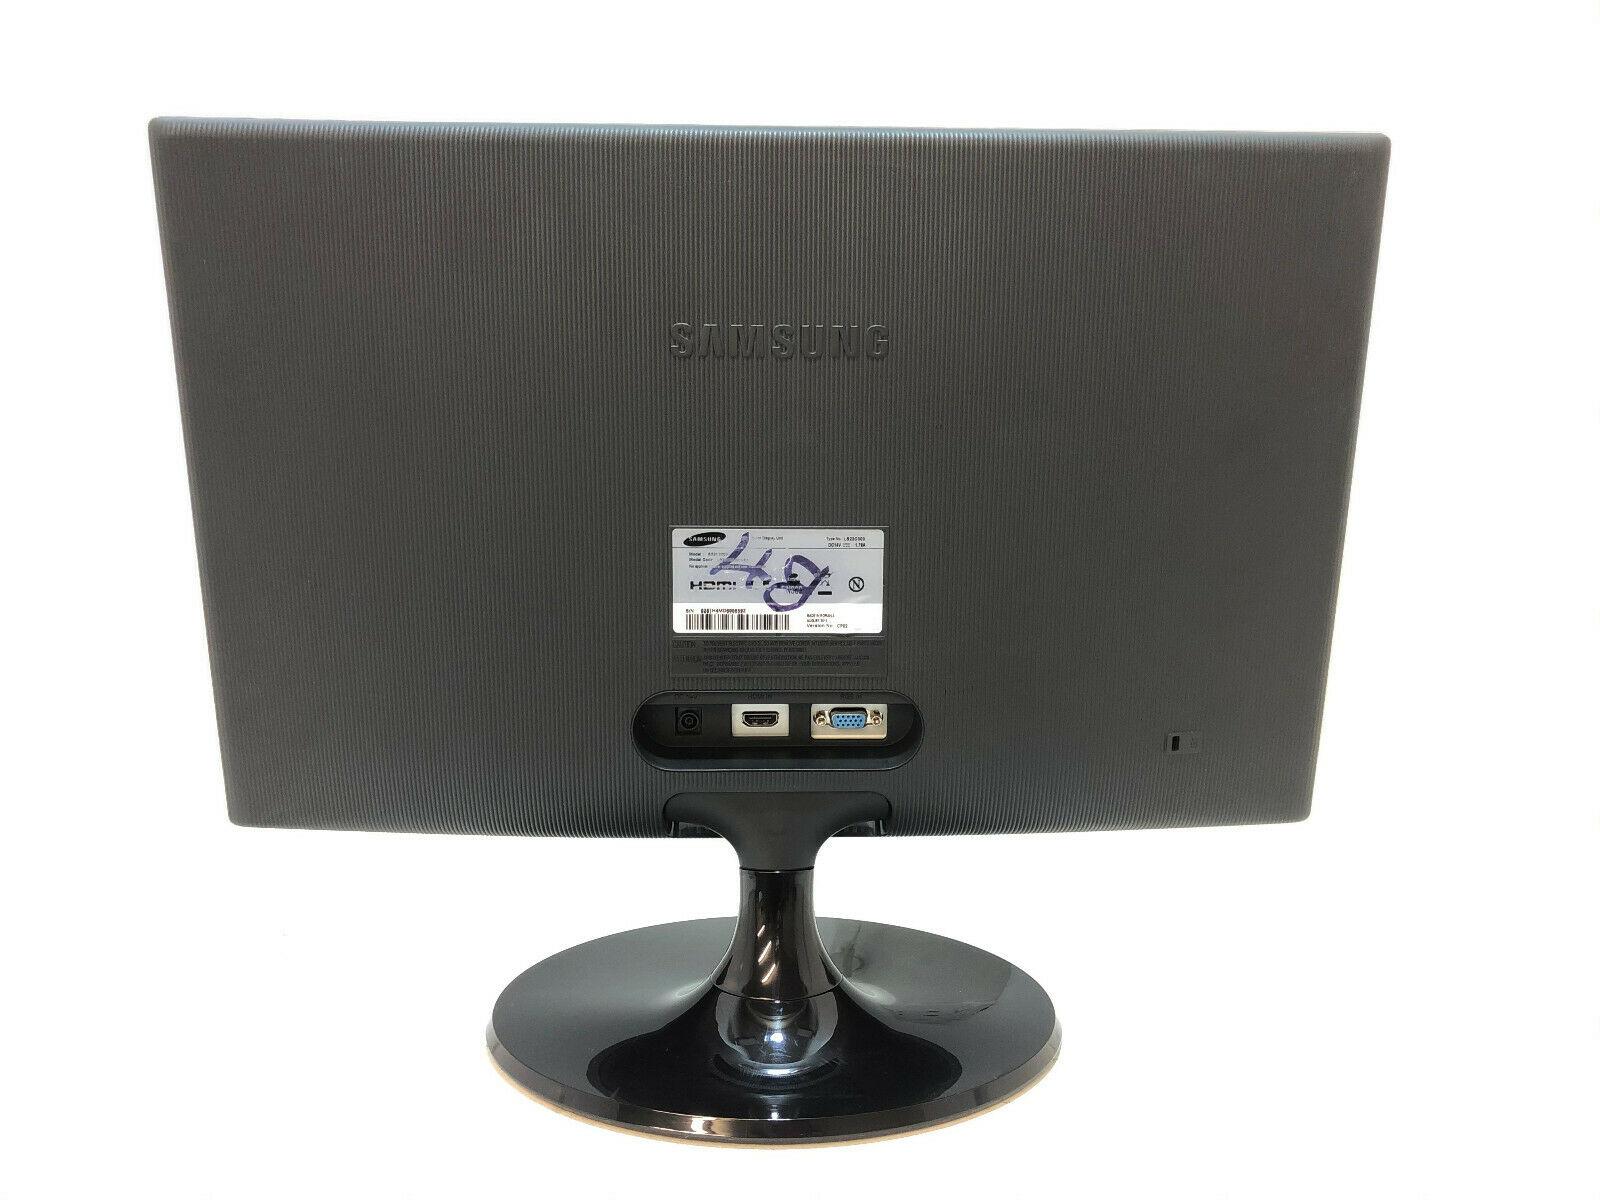 Samsung LS22C300 No 3